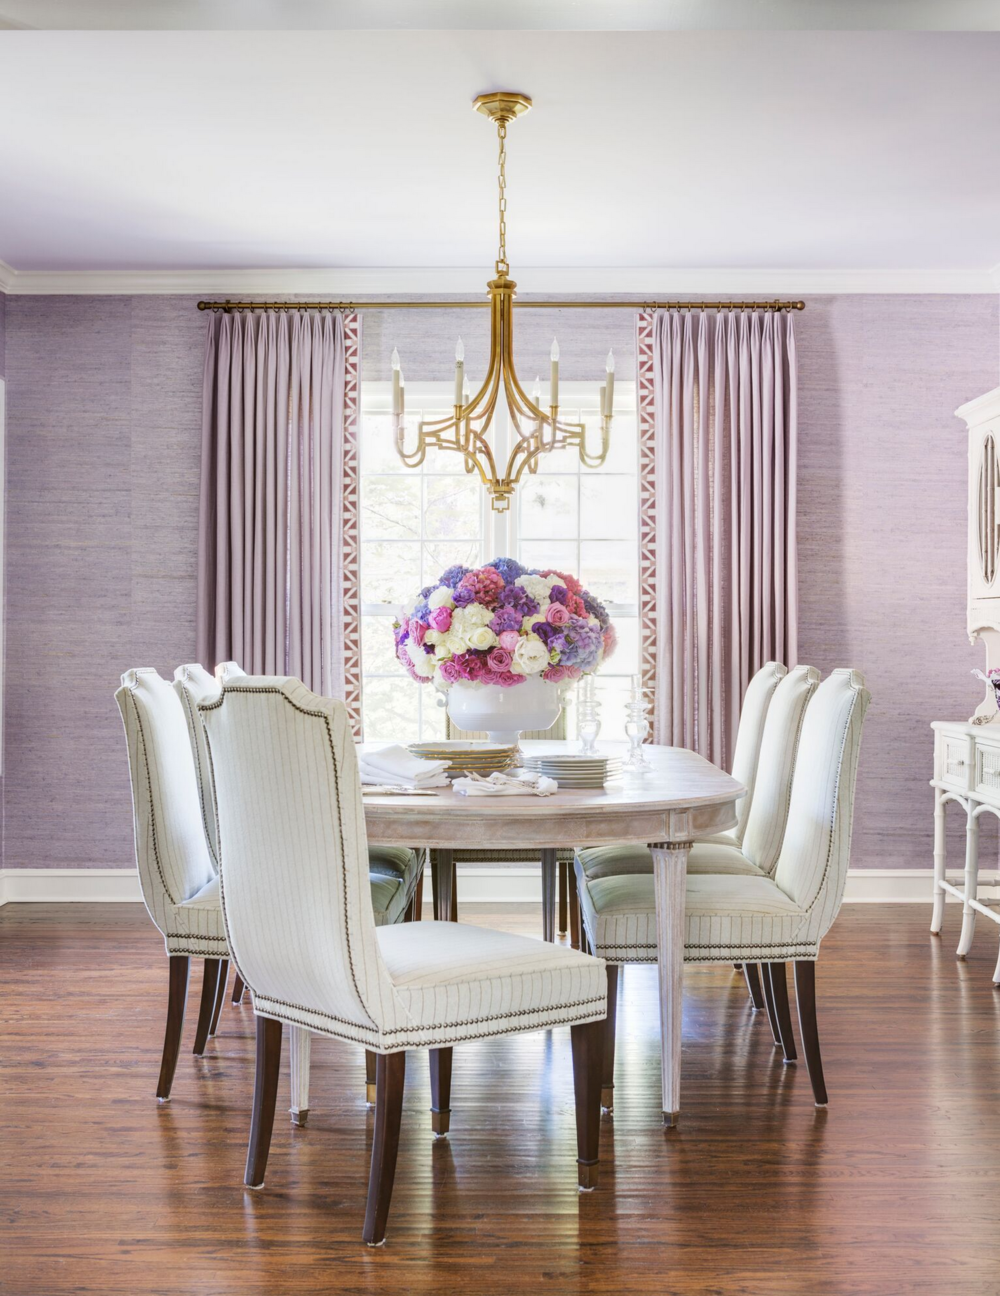 Beautiful Molly Ray Young Interior Design Little Rock Arkansas Dining Room Purple  Textured Wallpaper Rett Peek.